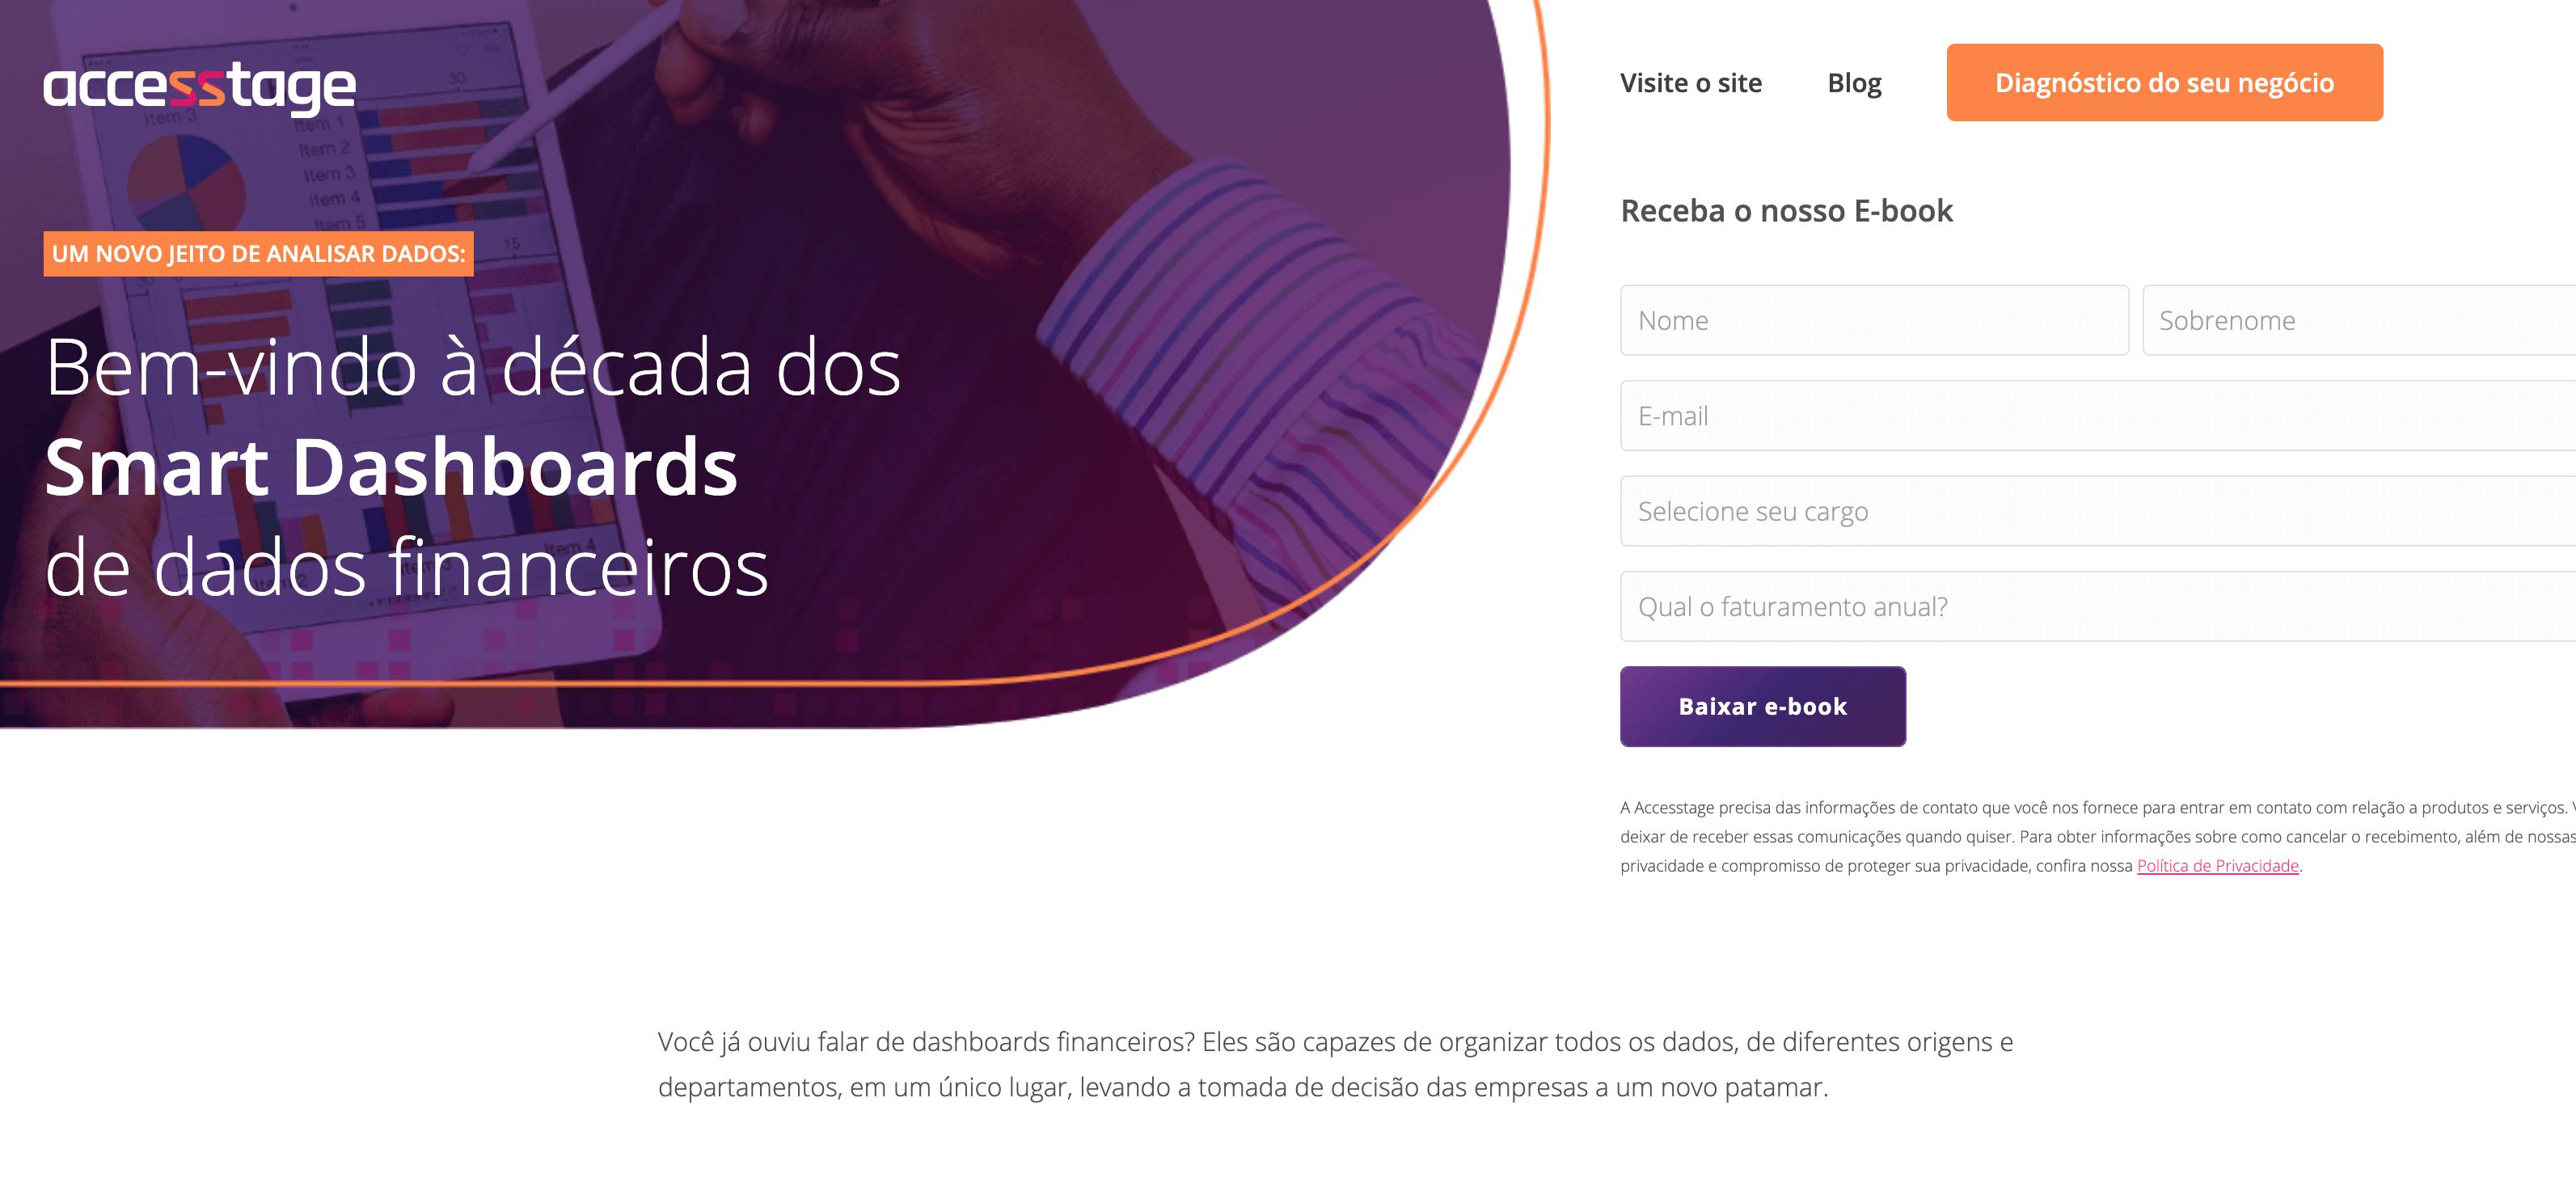 Landing Page Accesstage - Ebook